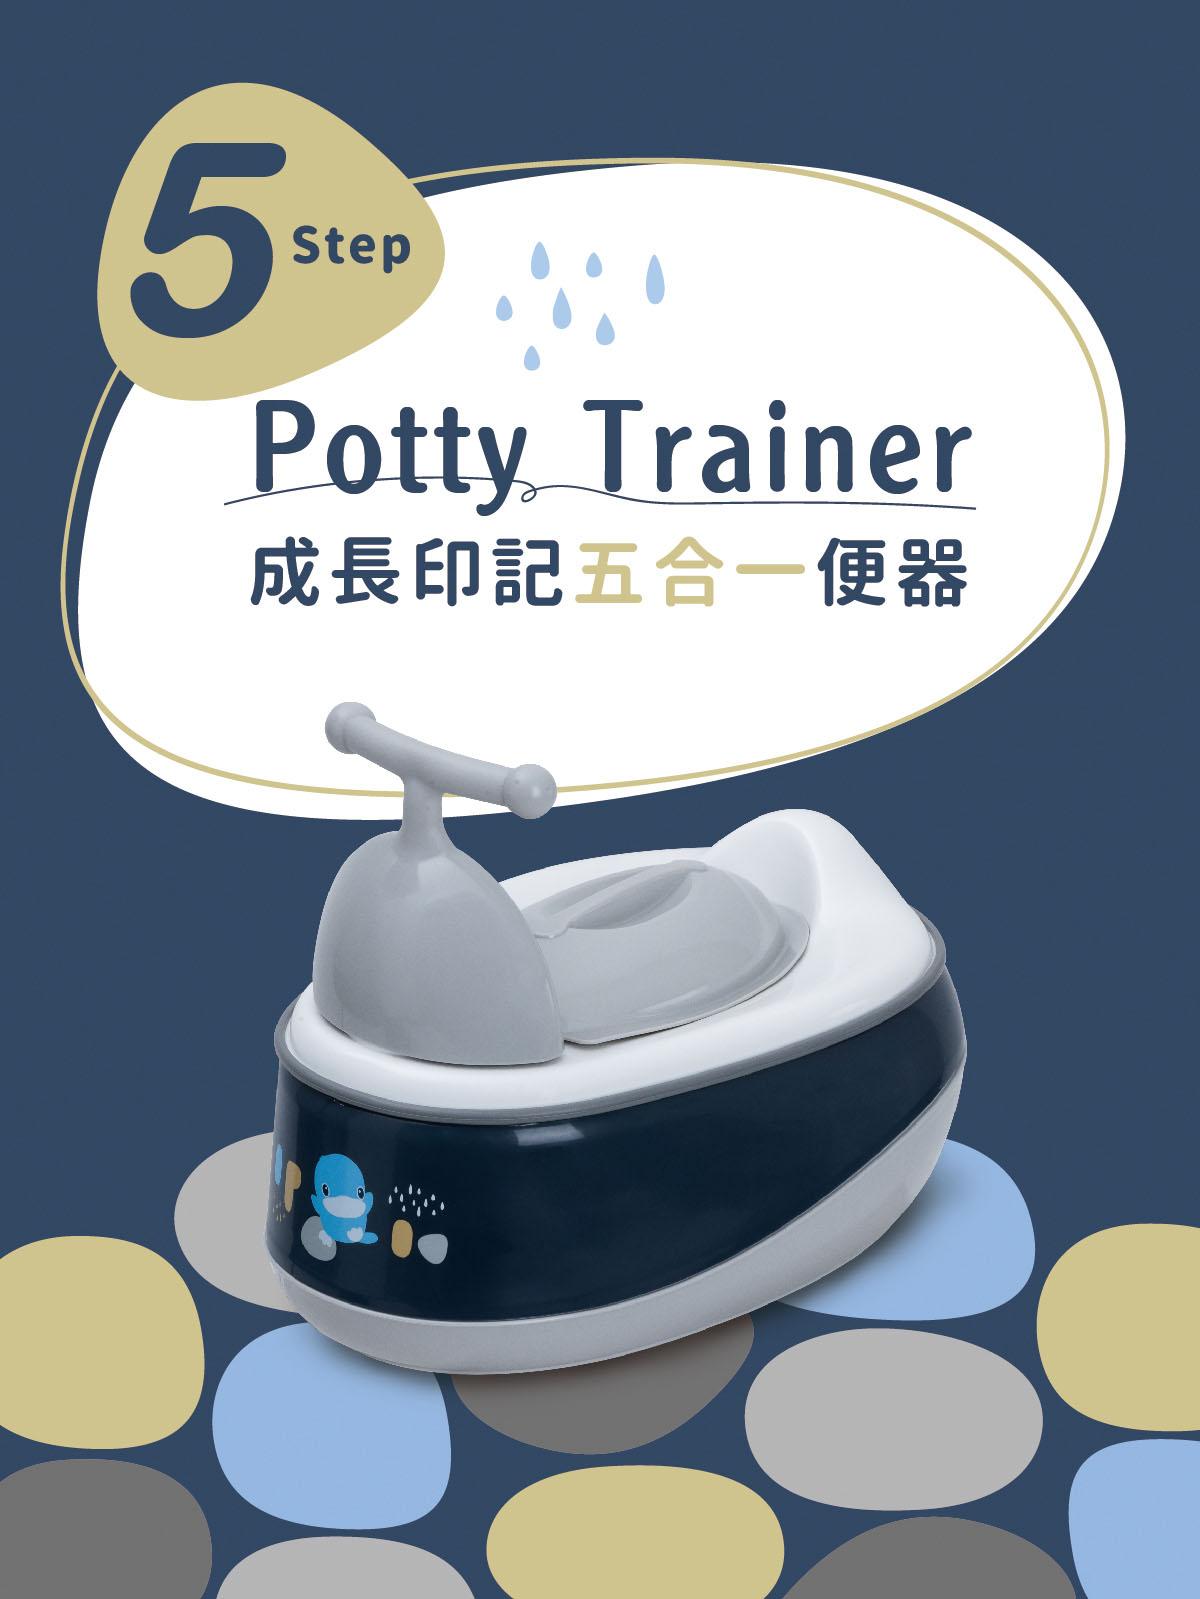 proimages/Bathing&CleanSeries/potty/1136/1136-EDM-1.jpg